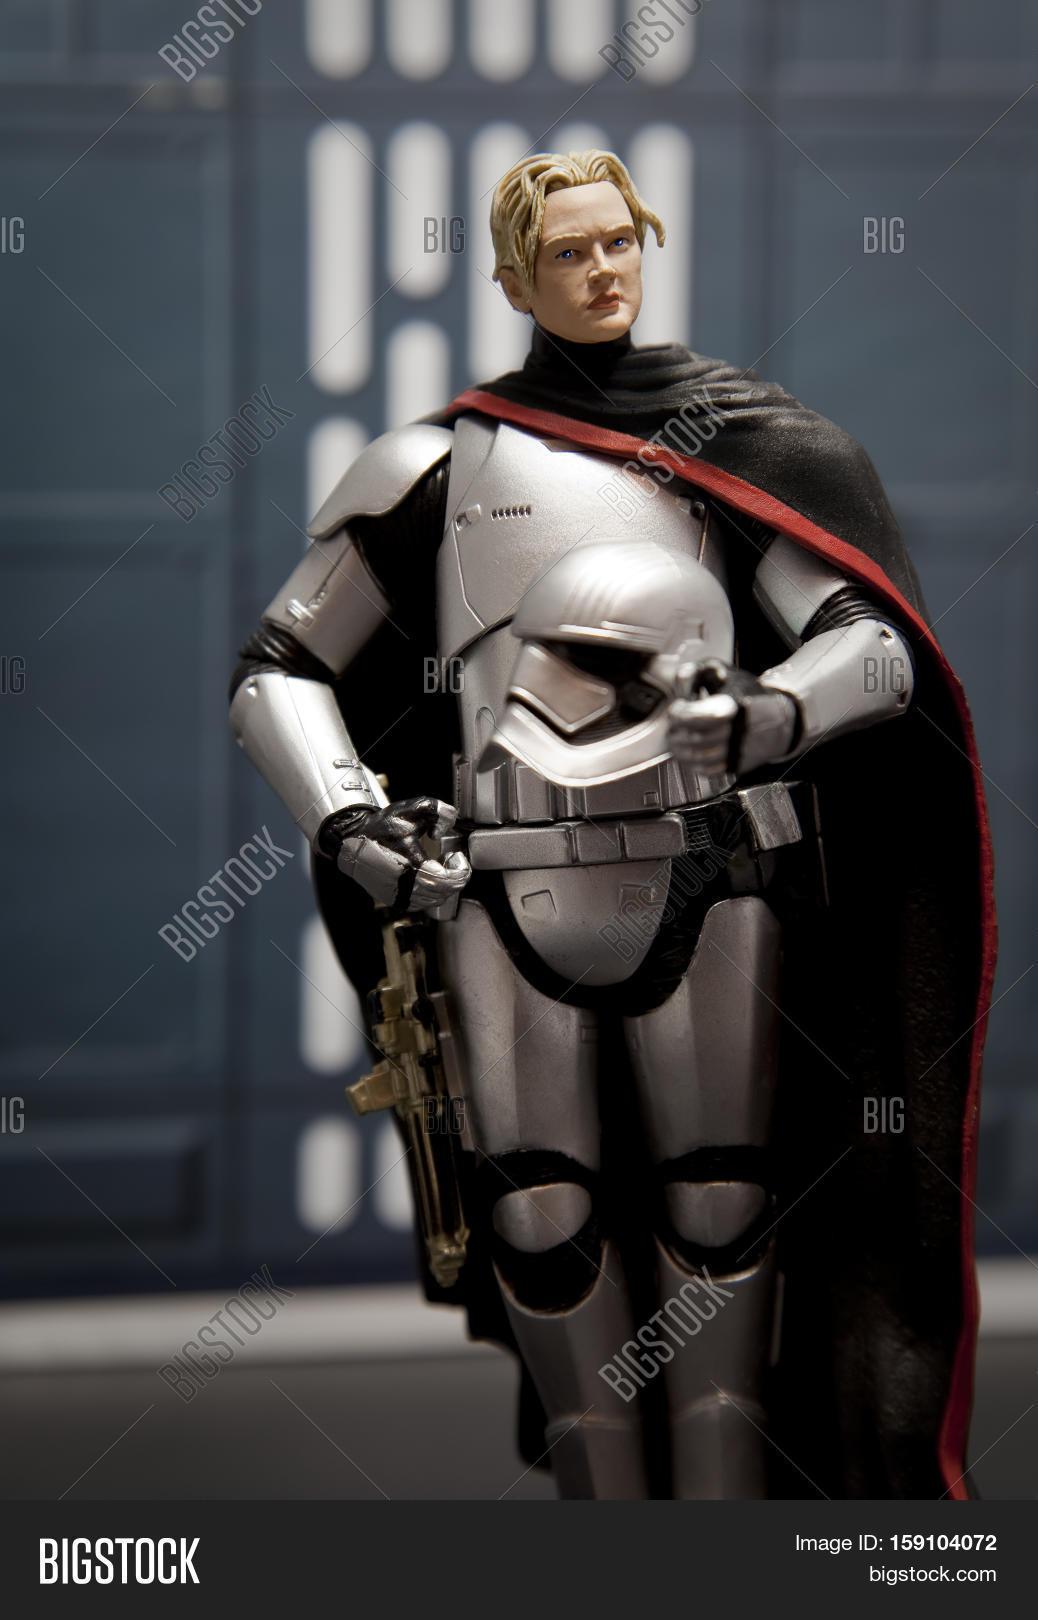 Star Wars Hasbro Black Image Photo Free Trial Bigstock